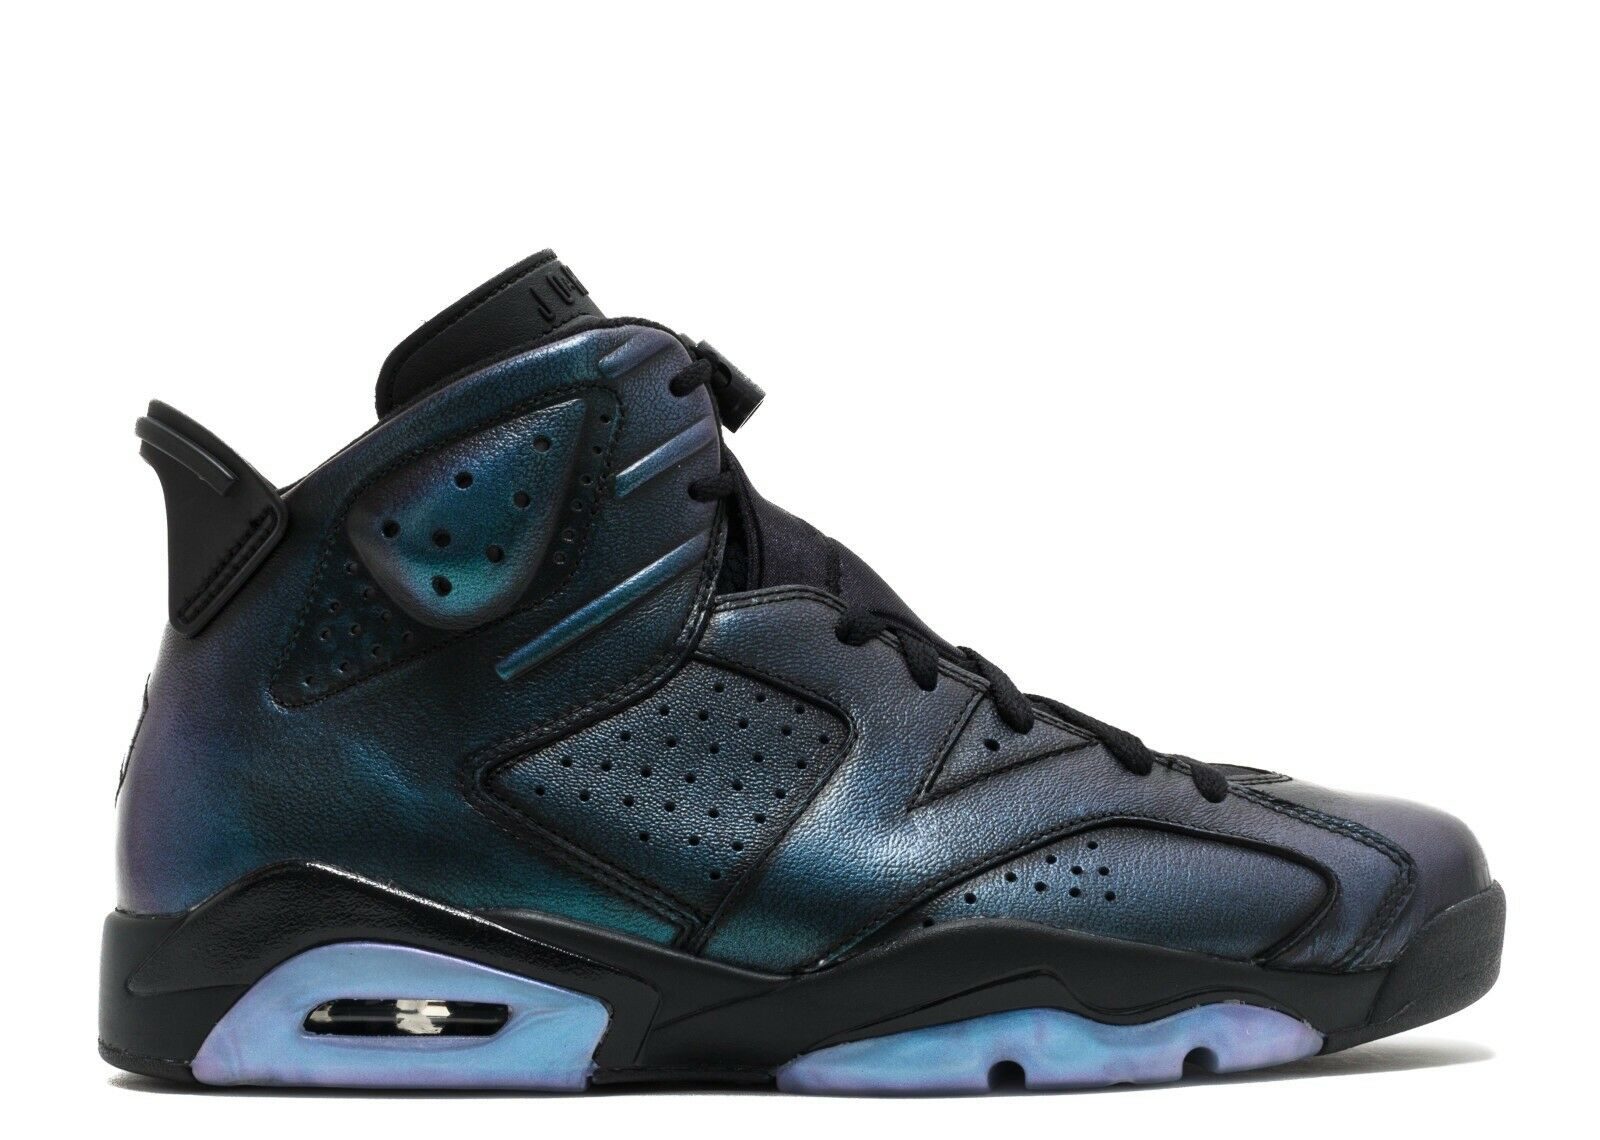 Air Jordan Retro 6 Chameleon All Star Gotta Shine 907961 015 Limited Größe 11